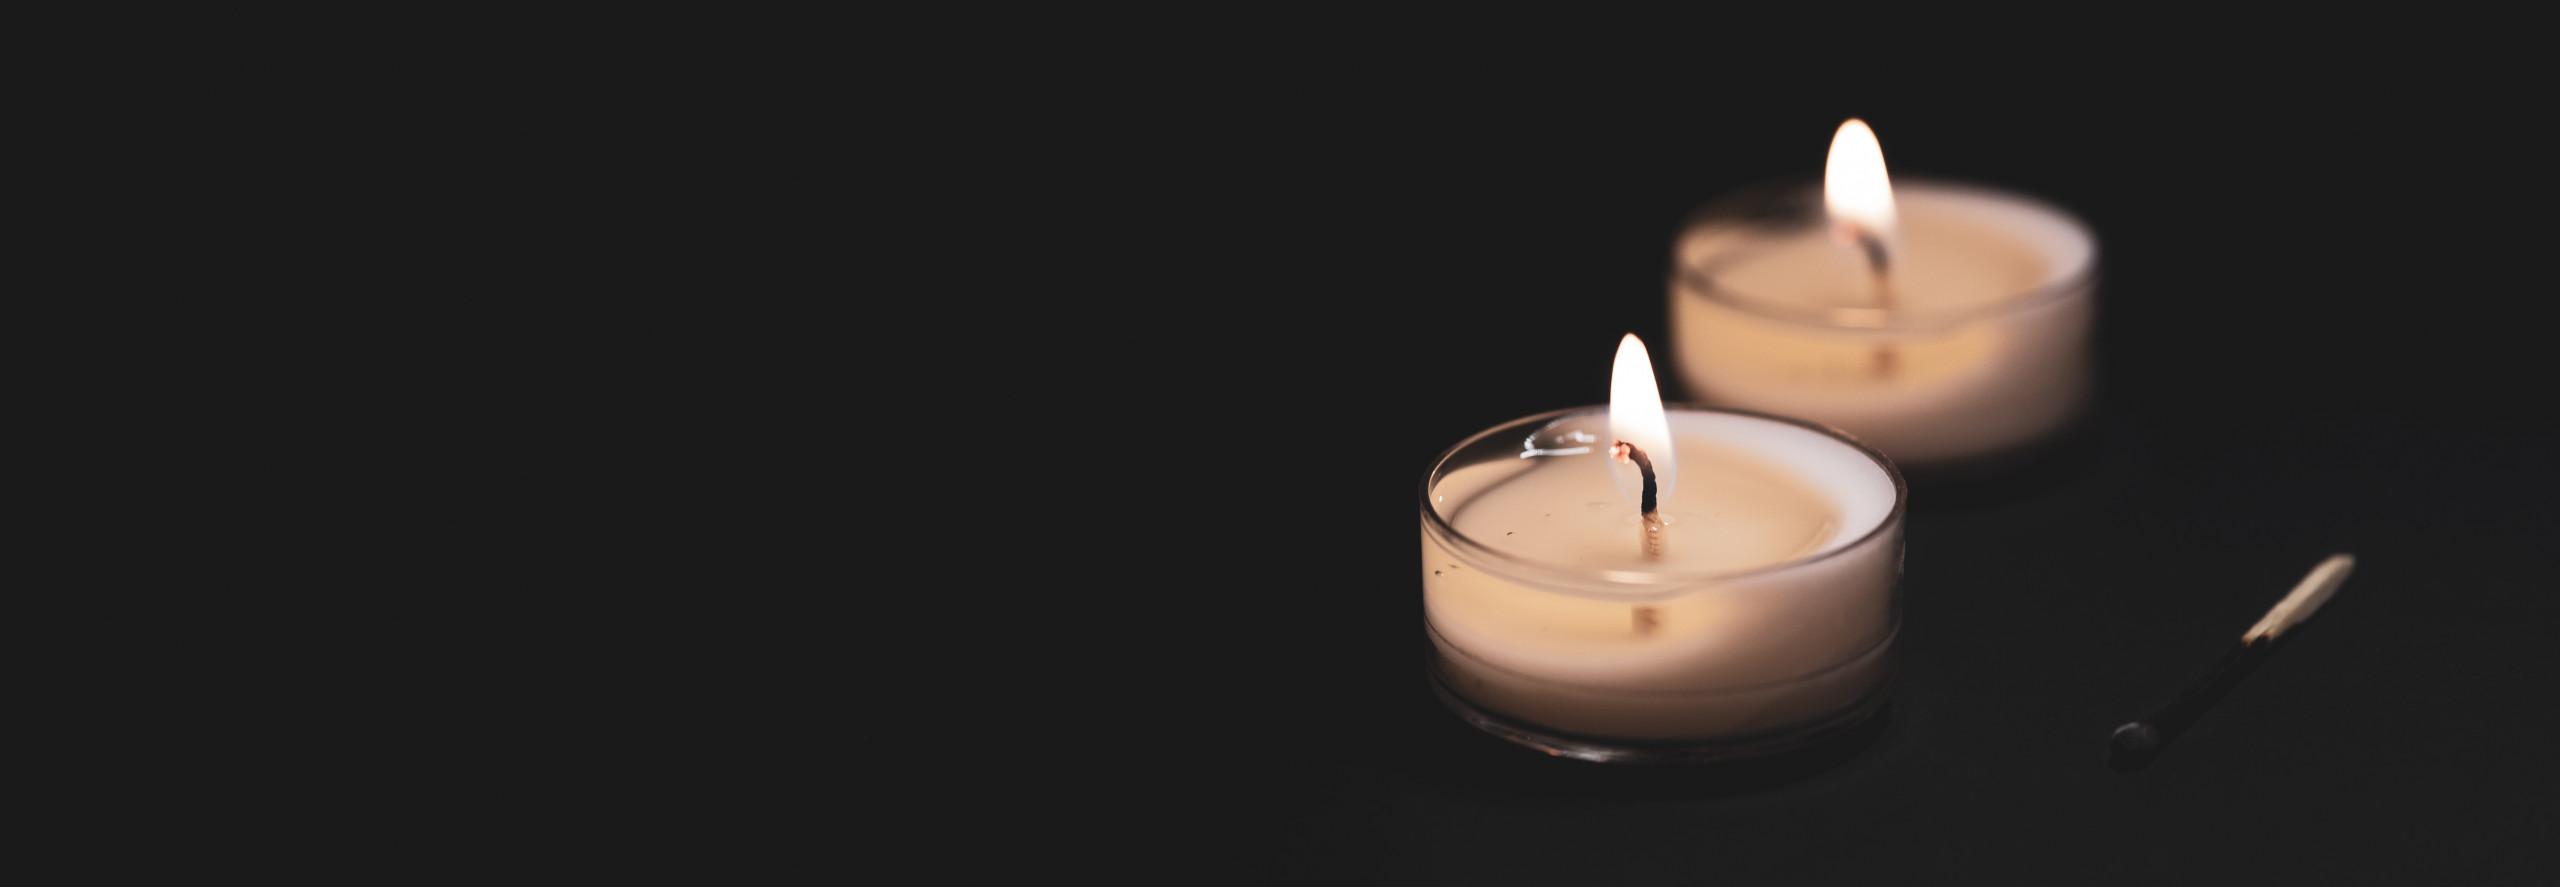 Condolence Donation Candles